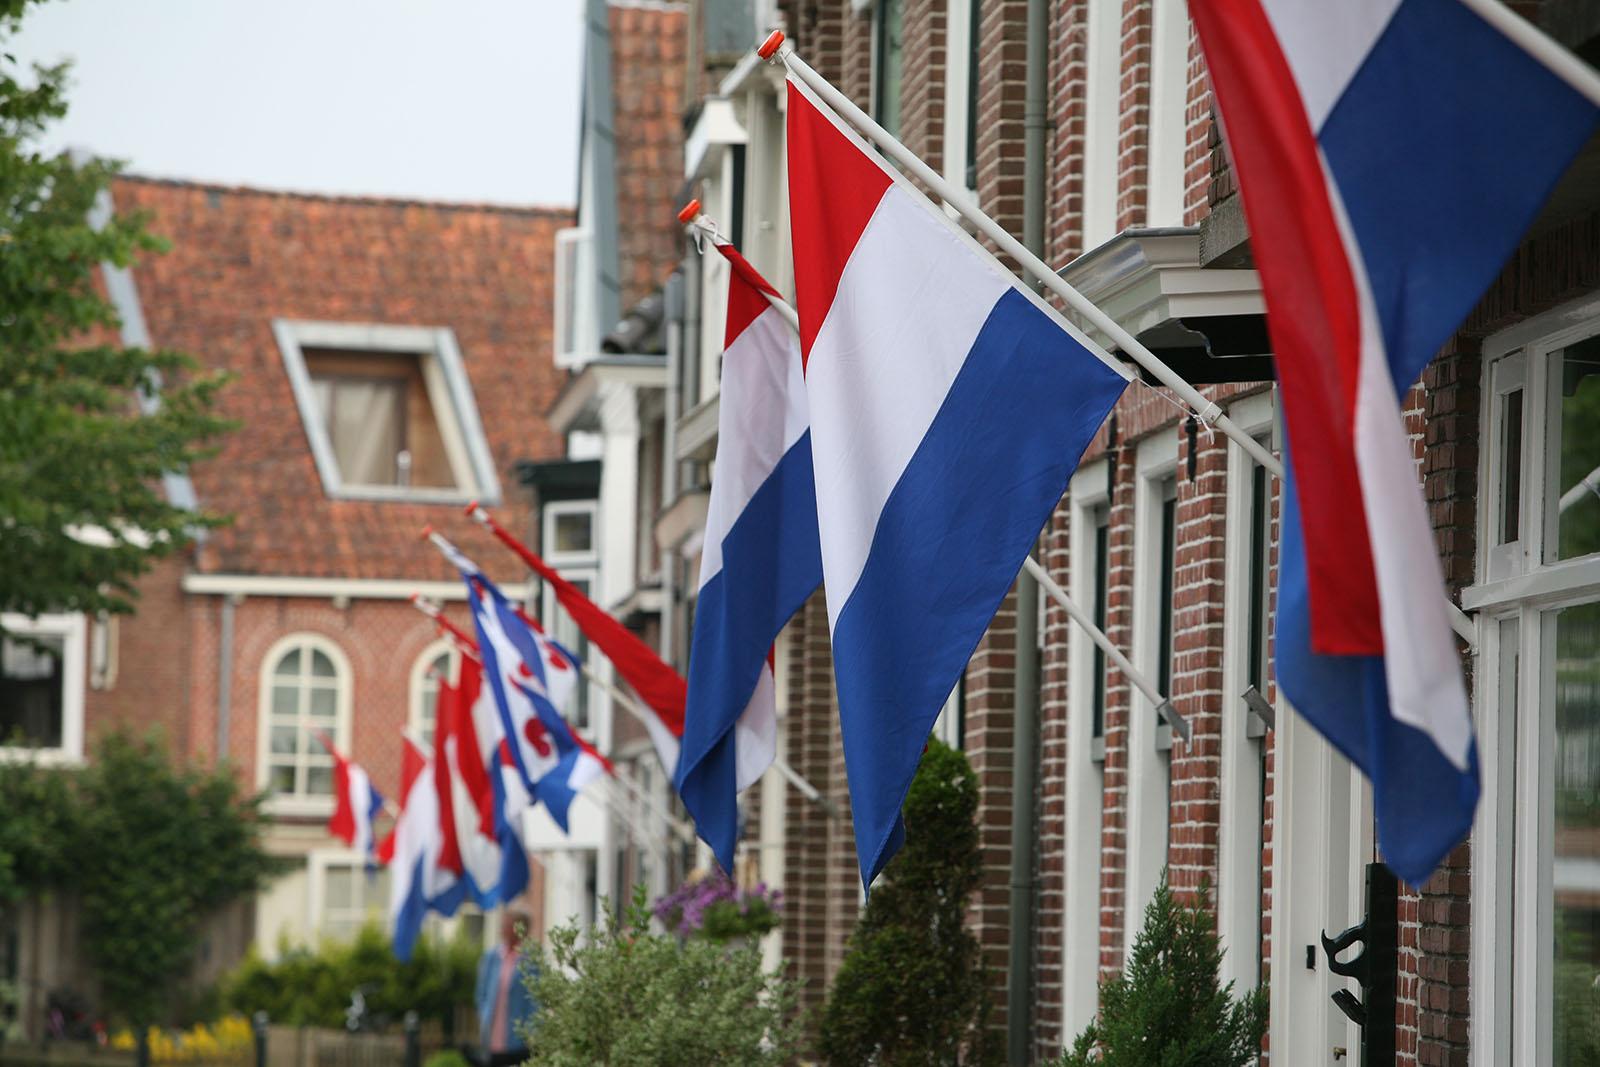 Hang de Nederlandse vlag uit!